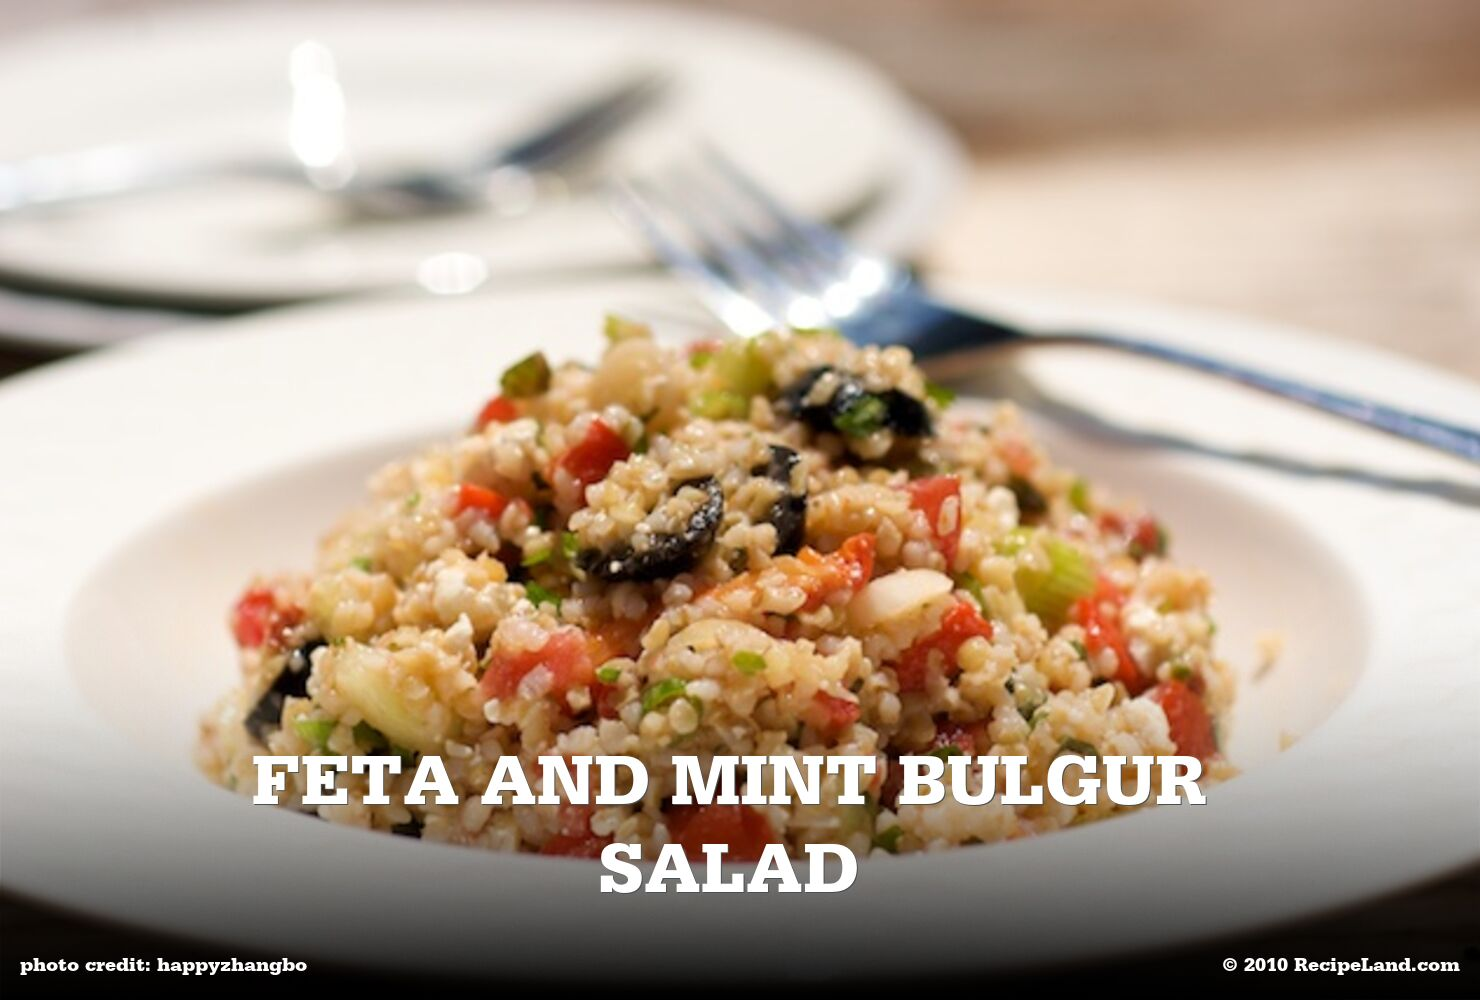 Feta and Mint Bulgur Salad